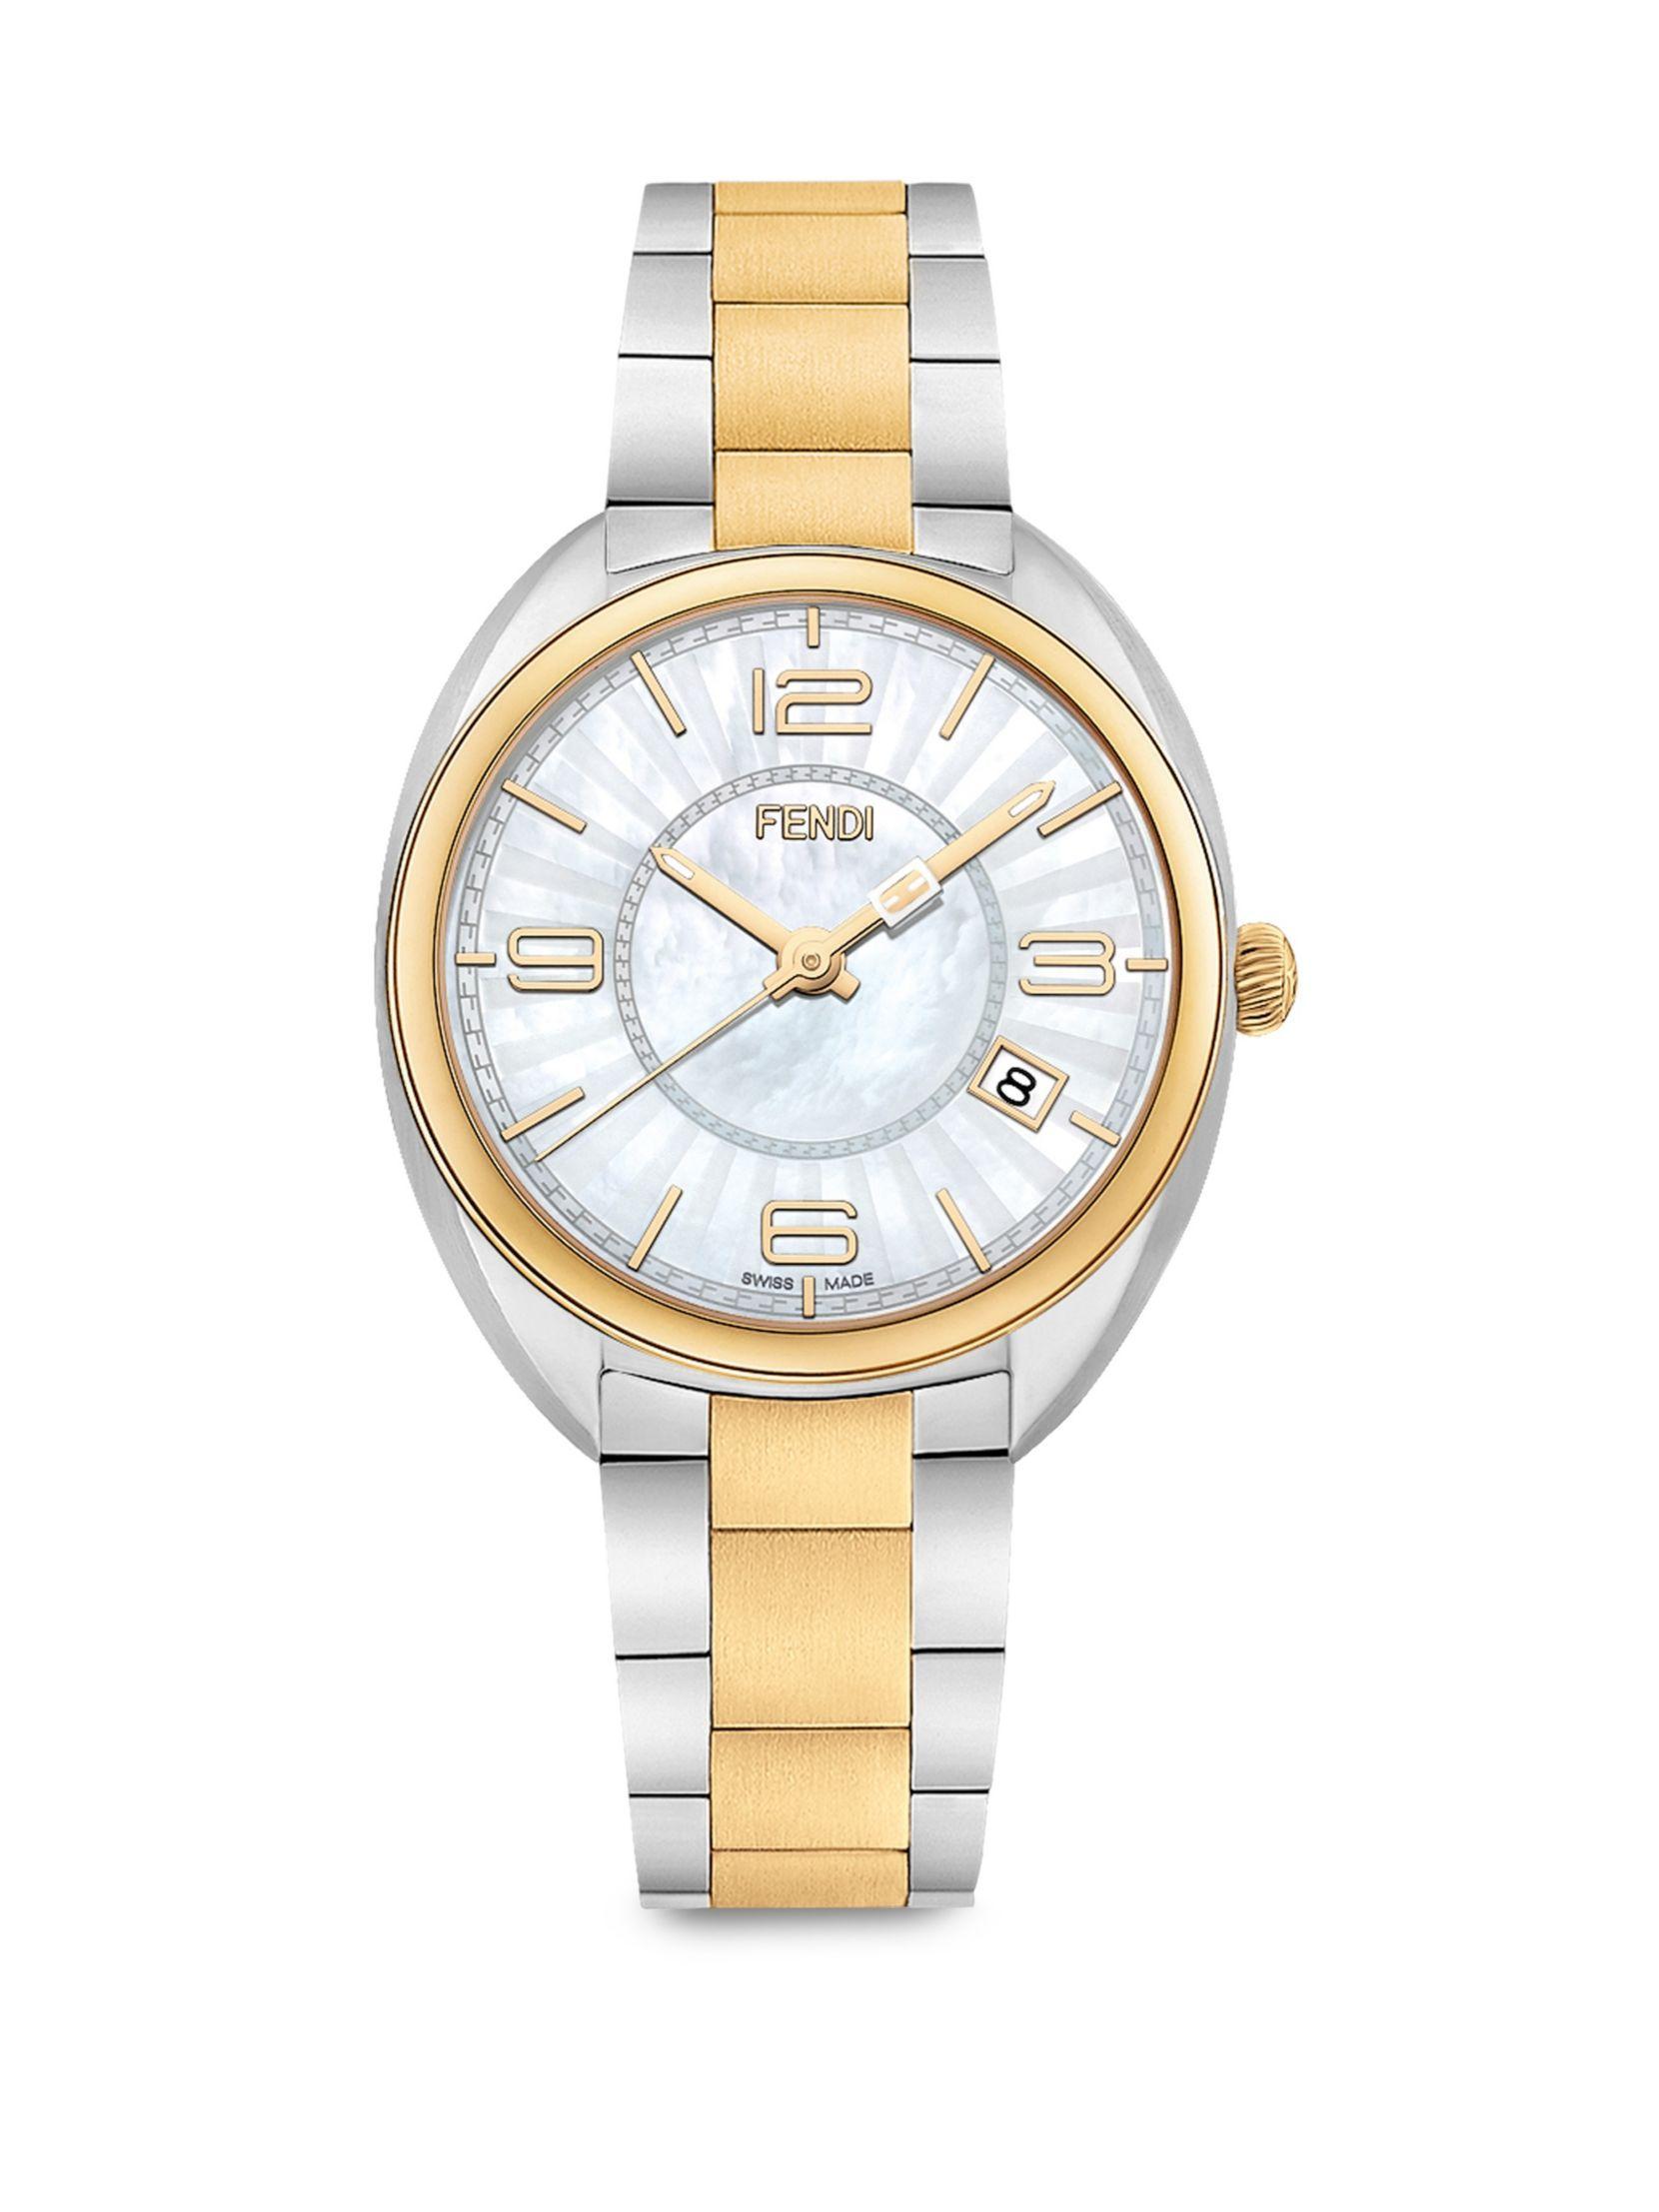 Fendi Momento Fendi Mother-Of-Pearl & Two-Tone Stainless Steel Bracelet Watch